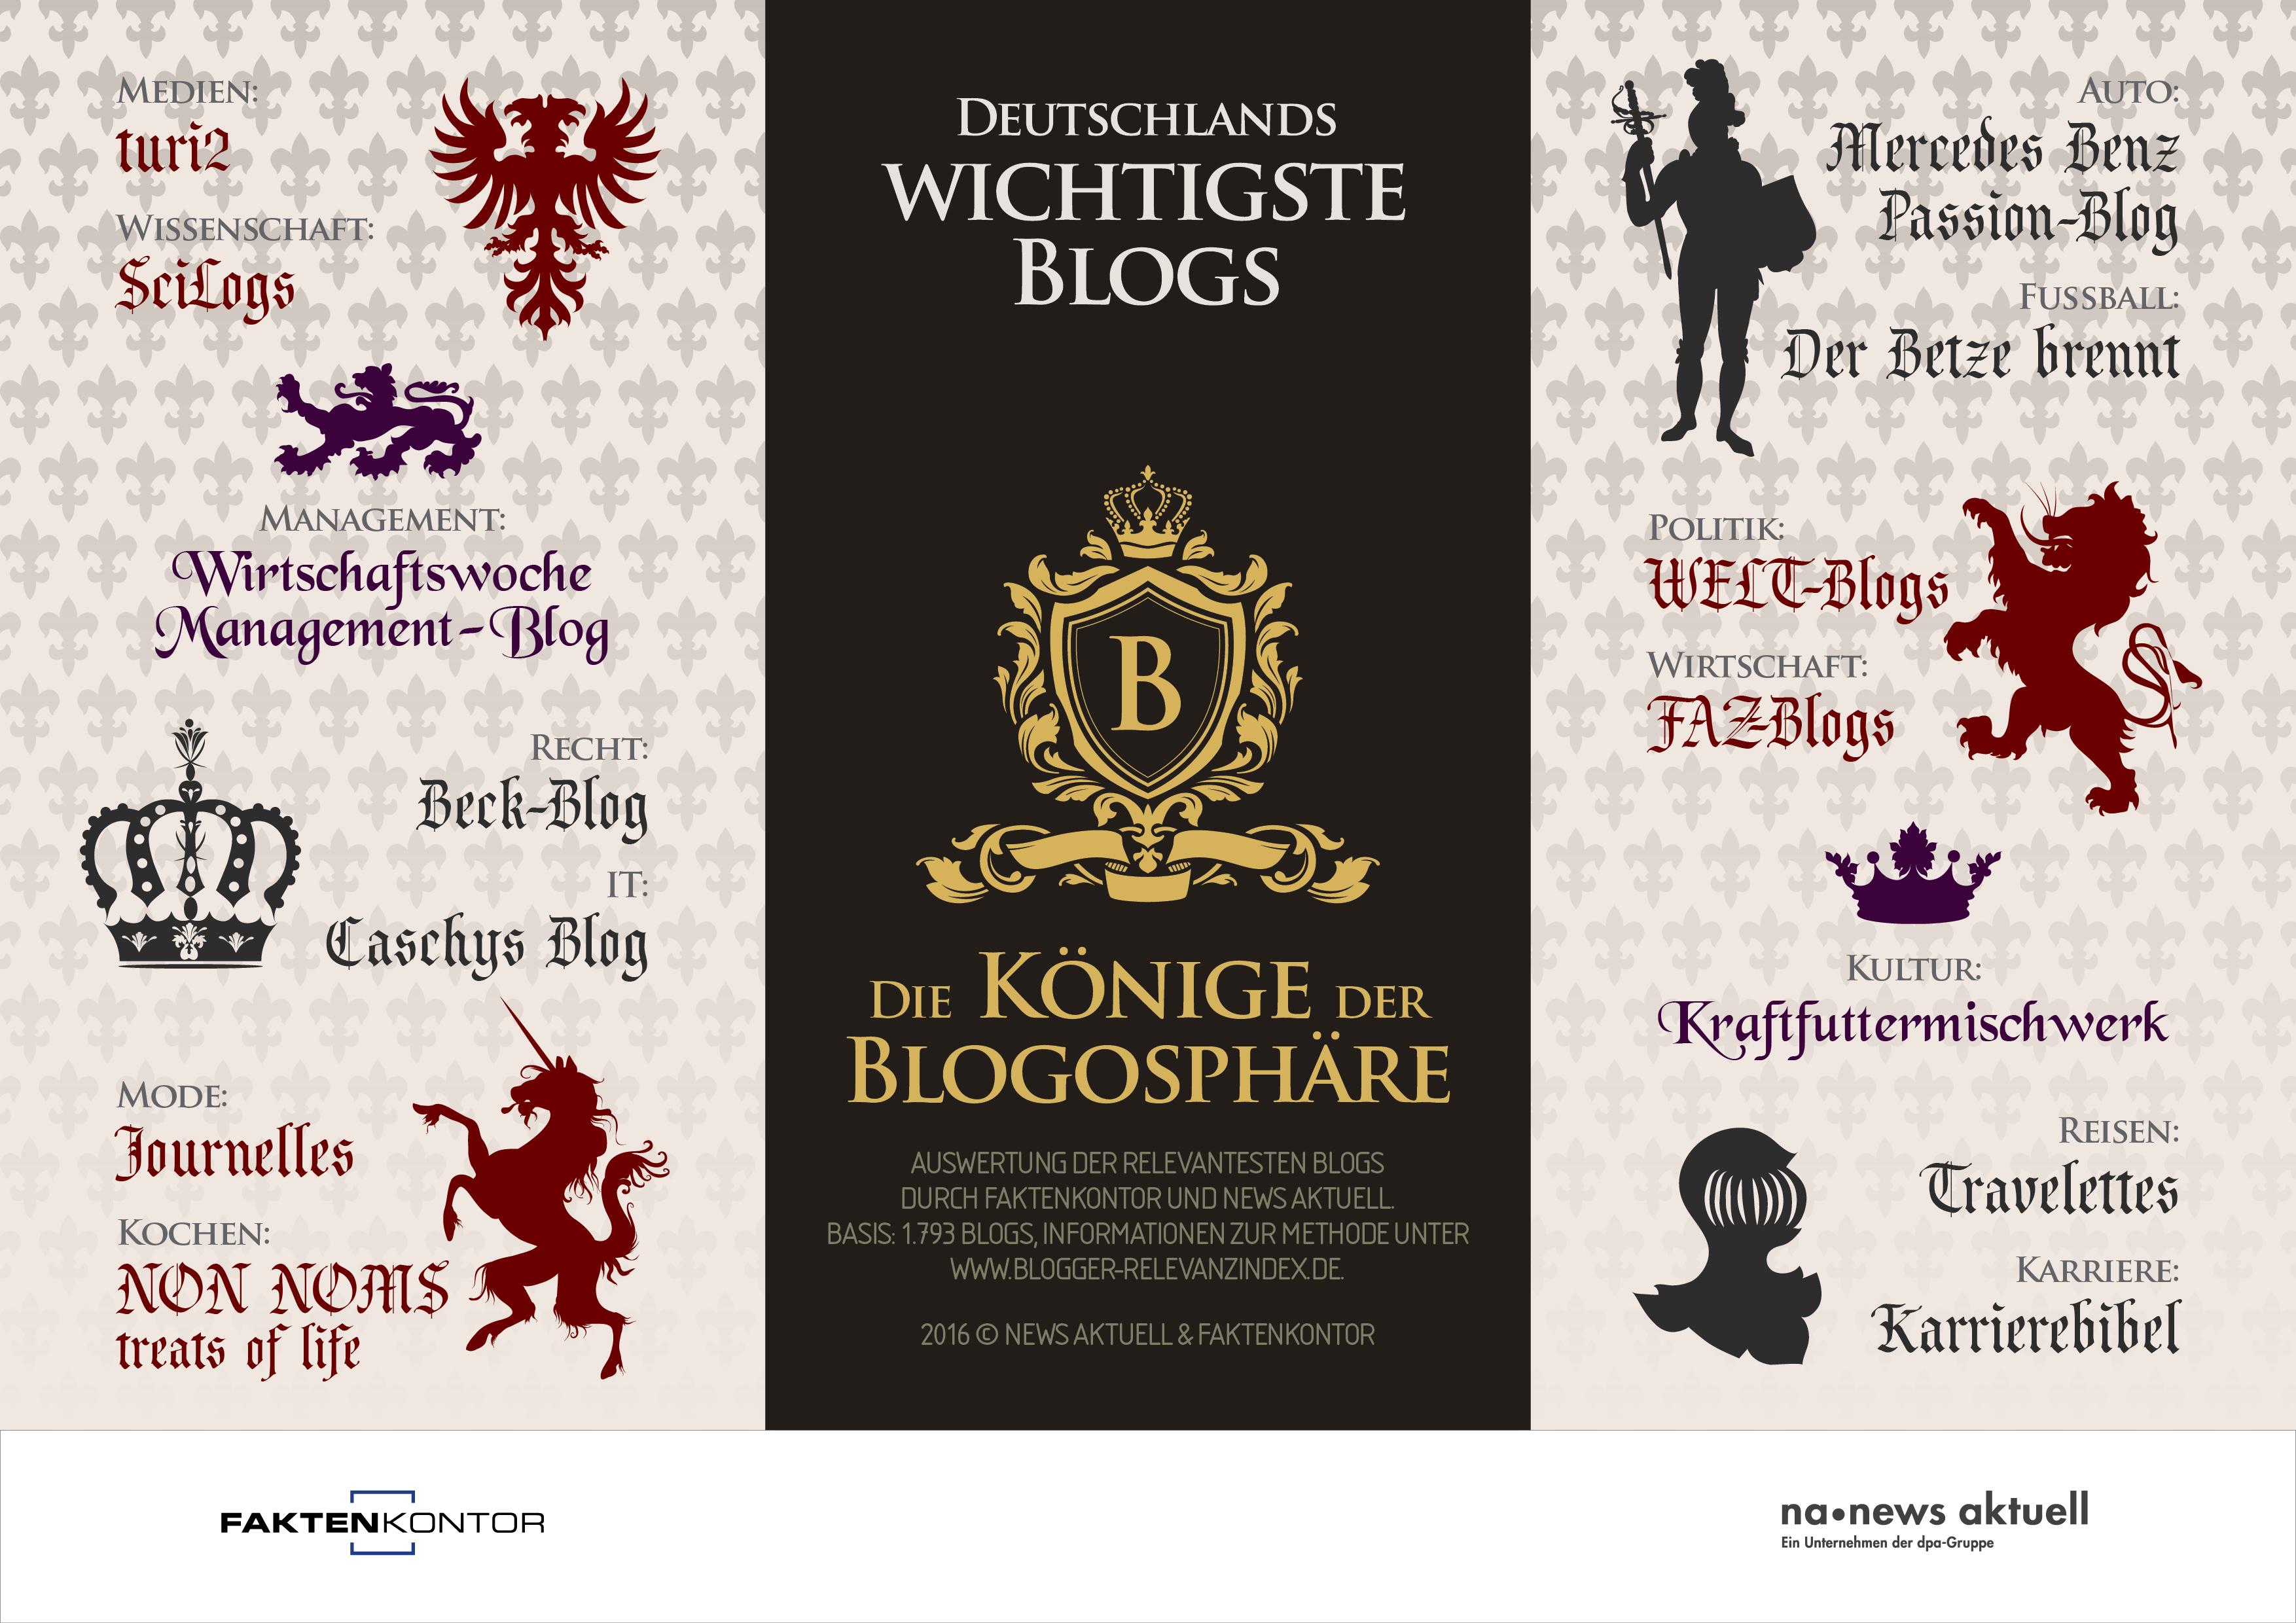 Könige der Blogosphäre